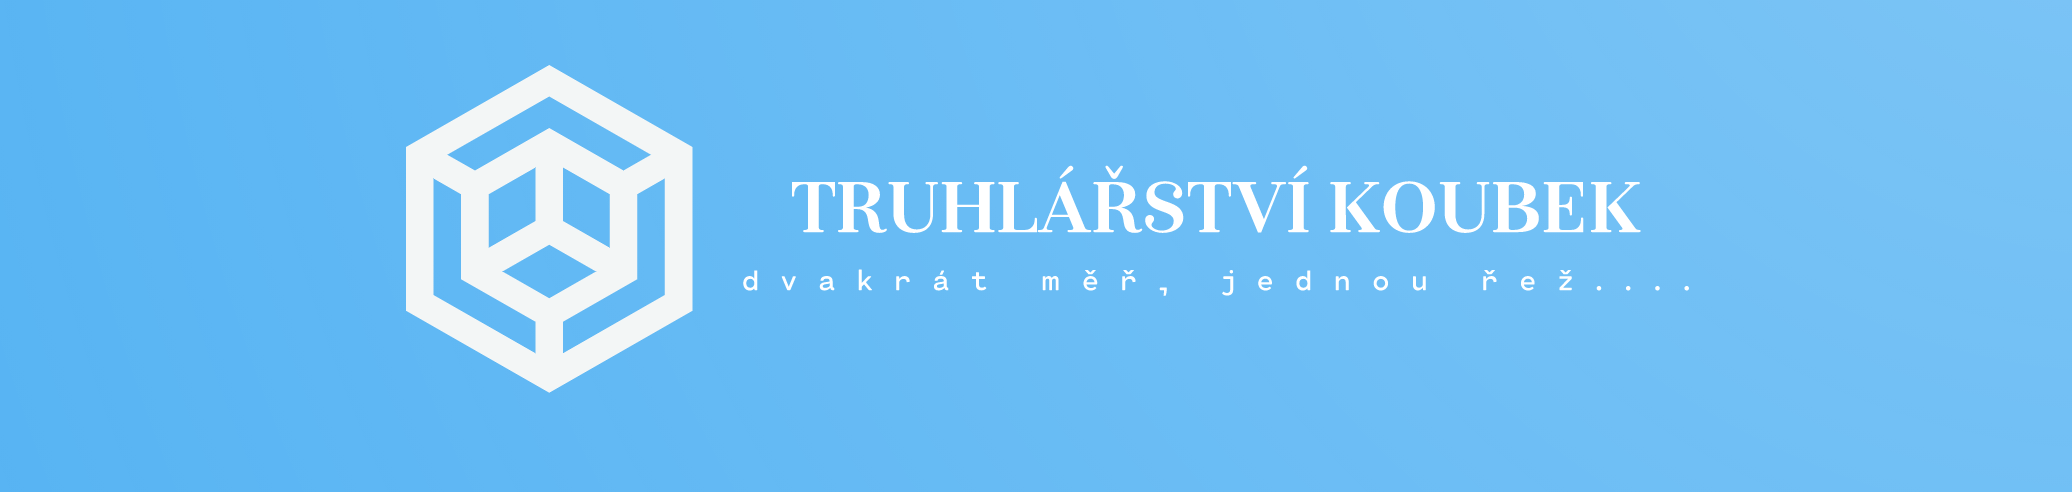 logostihleKoubek